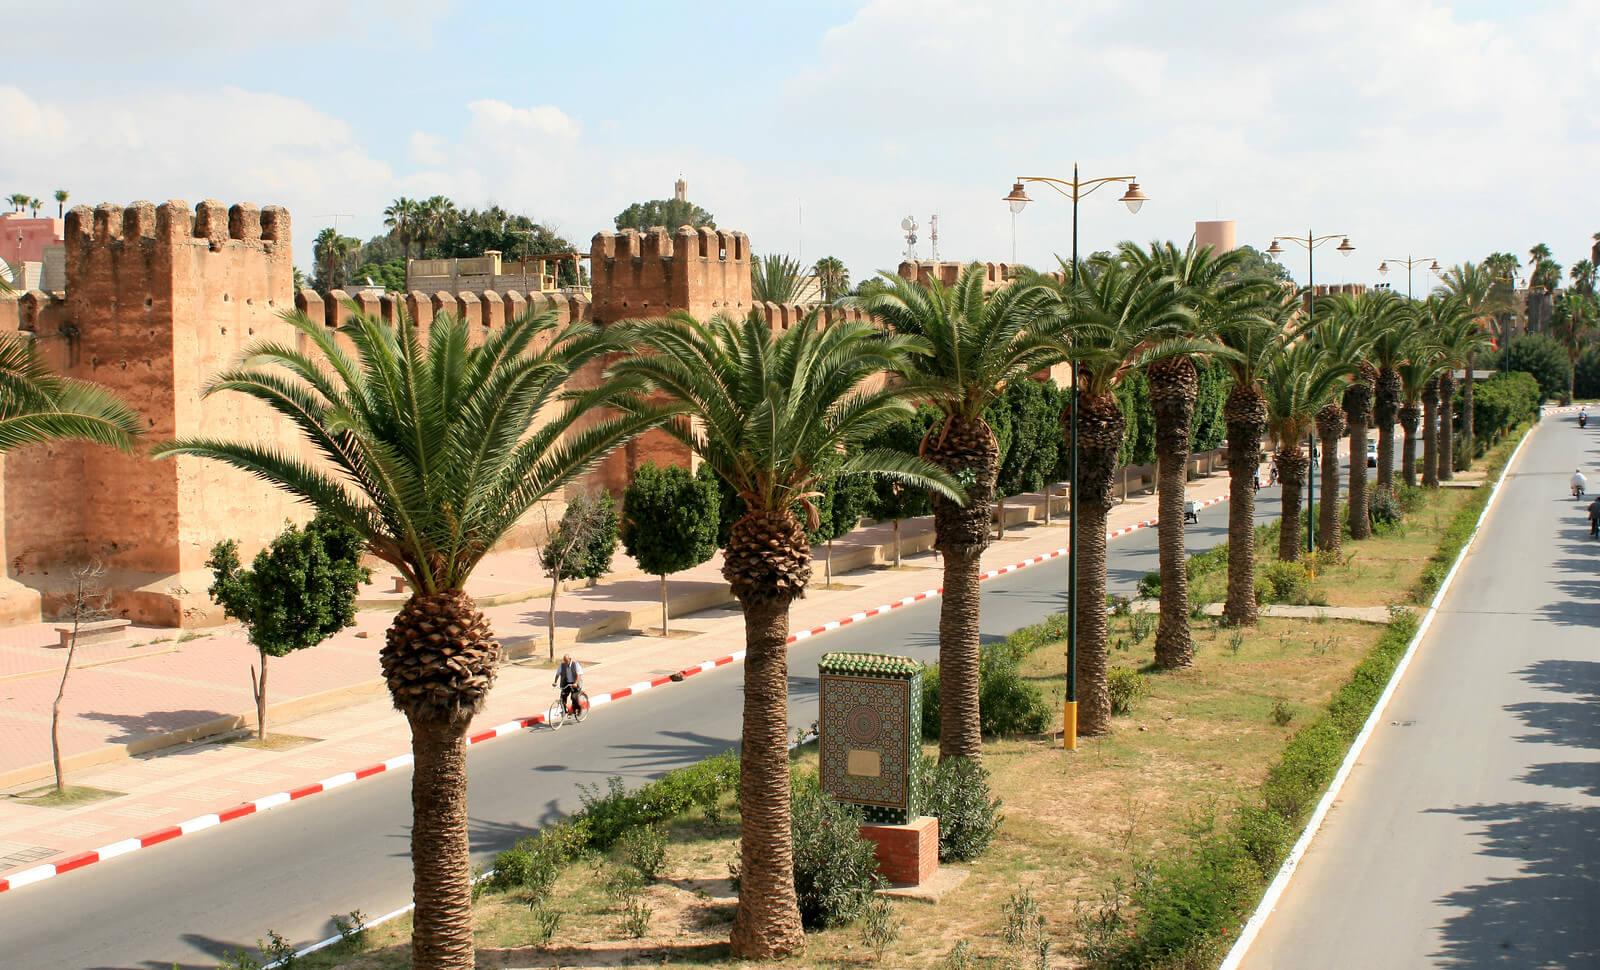 The Walls of Taroudant